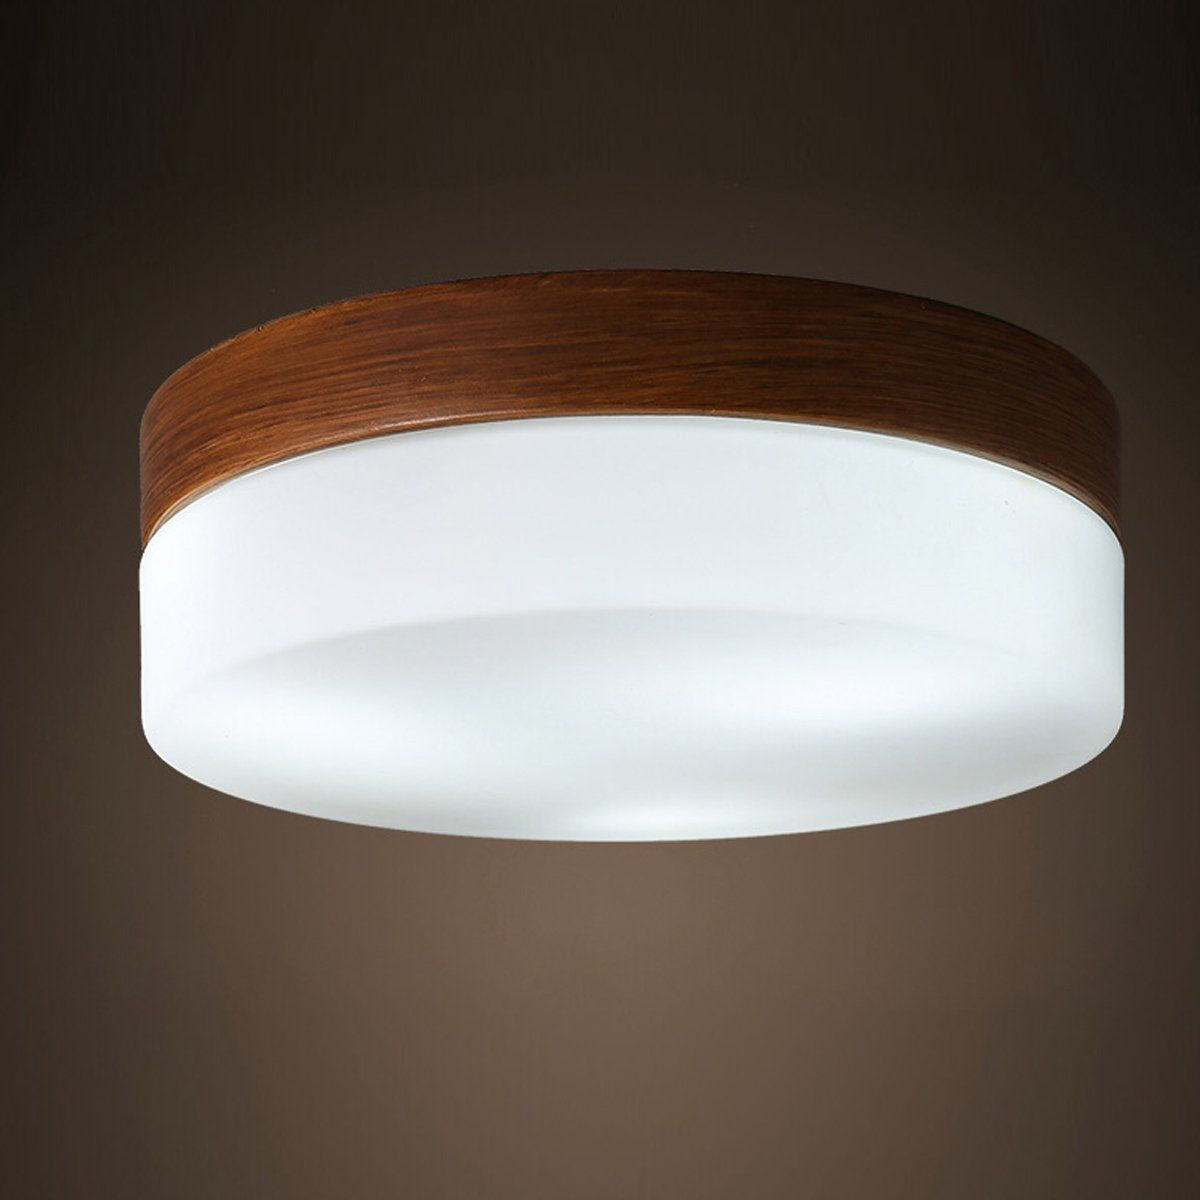 Maso Home Ms61757 The Led Simple Design Fashion Ceiling Light Of